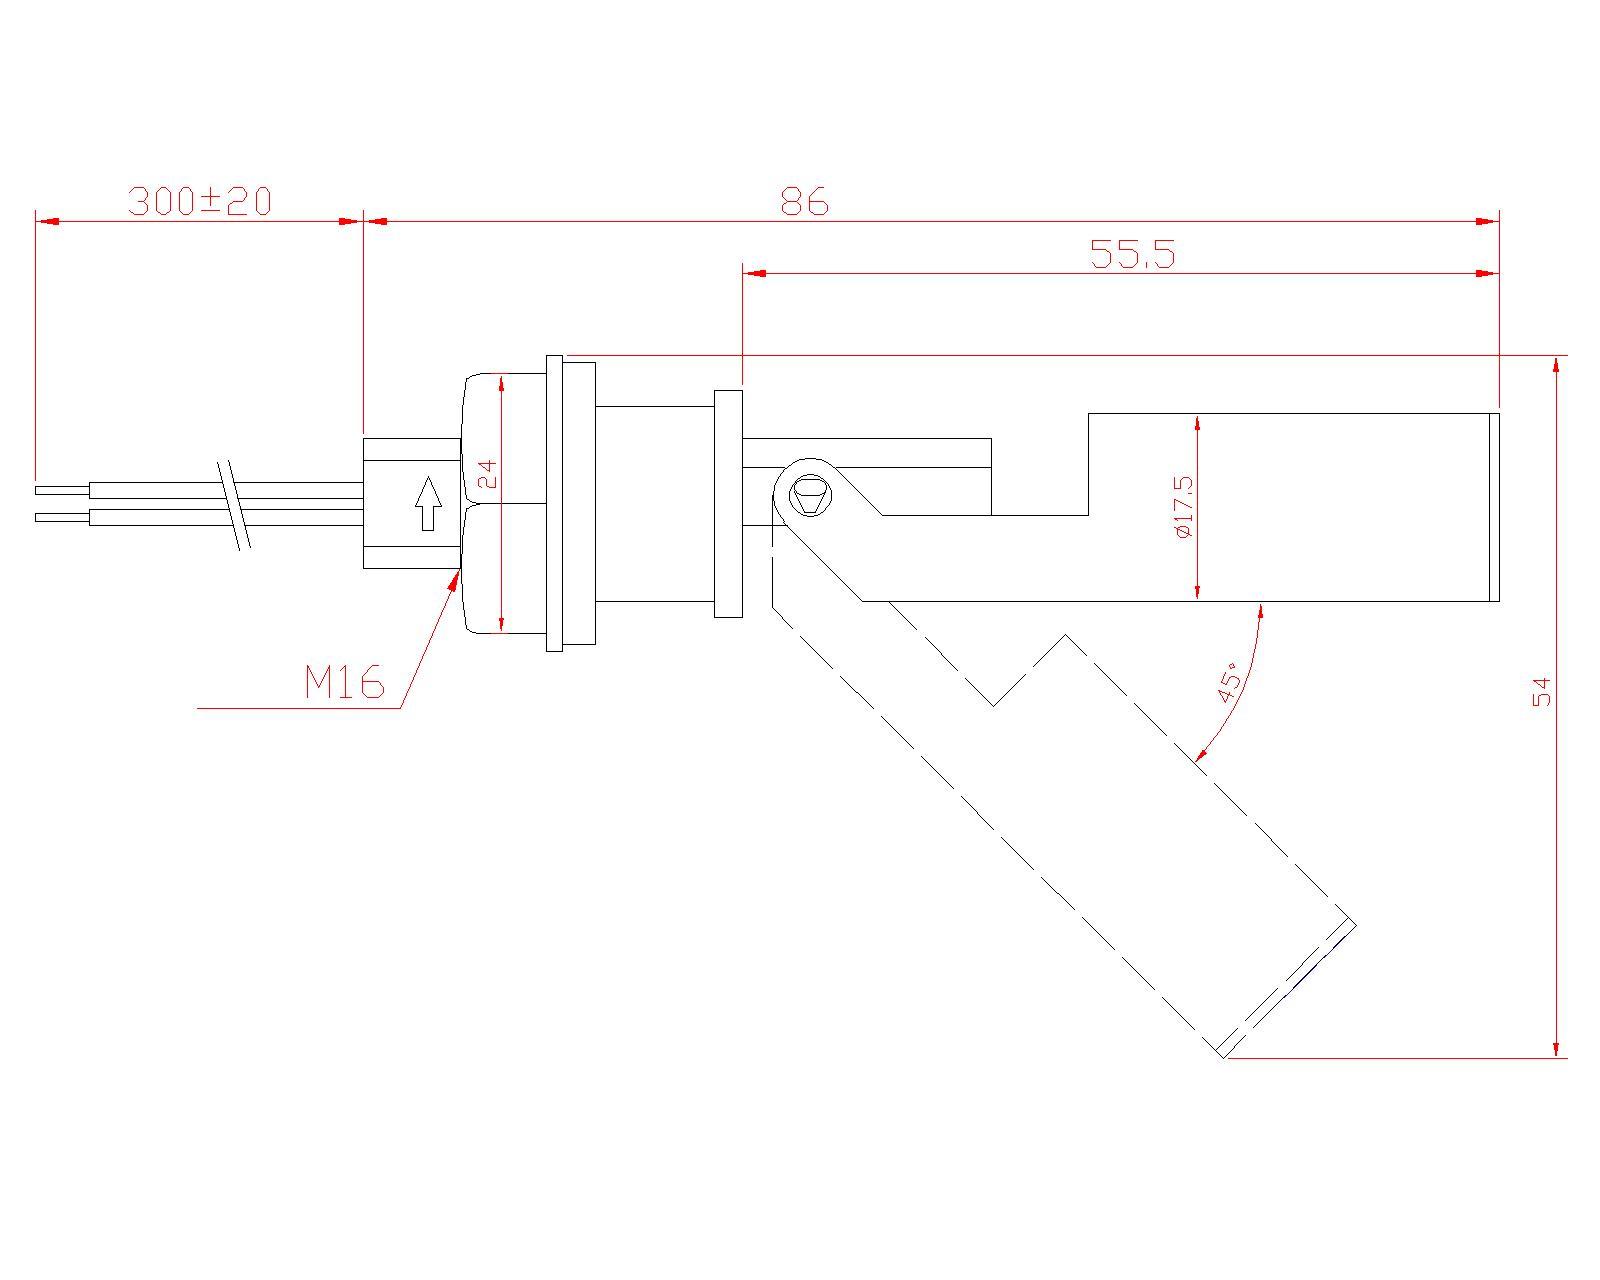 5c Sensor Water Float Level Switch Magnetic Level Sensor 5cfs-yz-4 - Buy  Float Level Switch,Water Level Sensor Product on Alibaba com